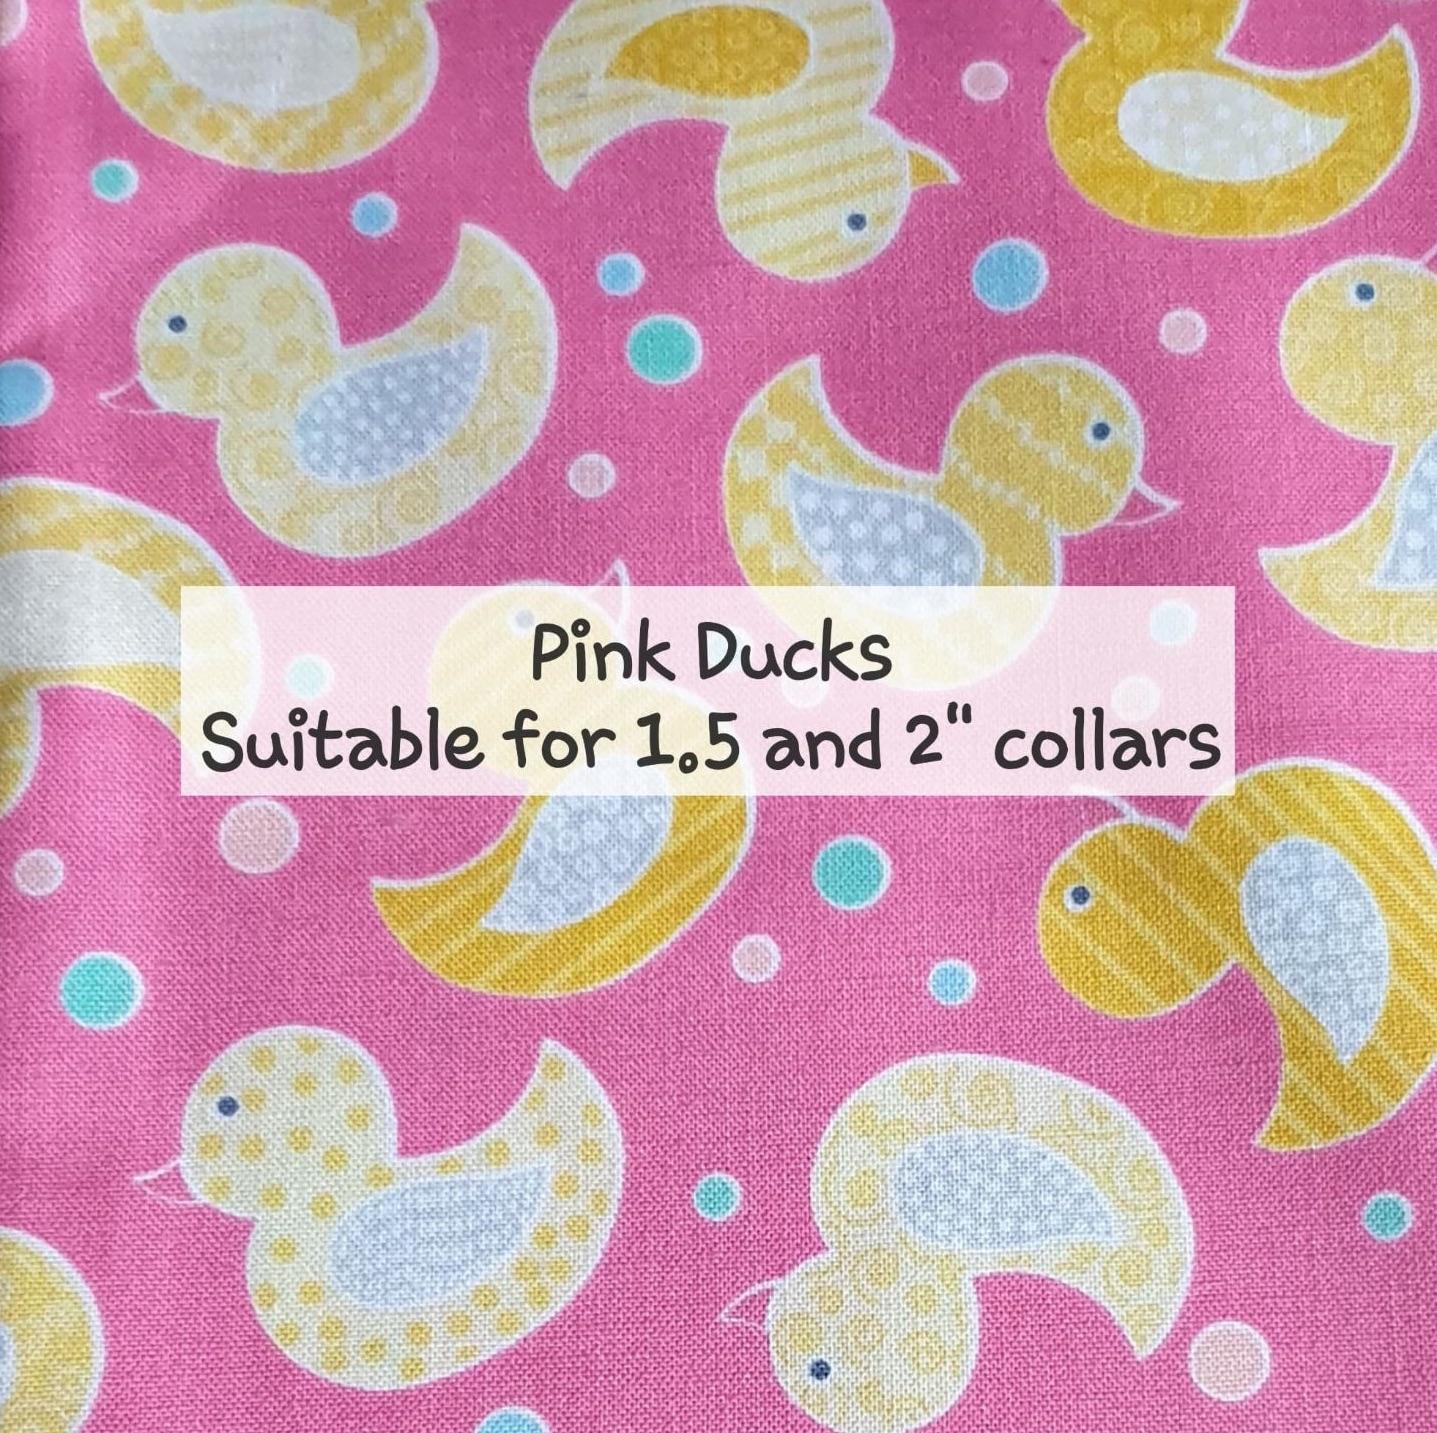 Pink Ducks